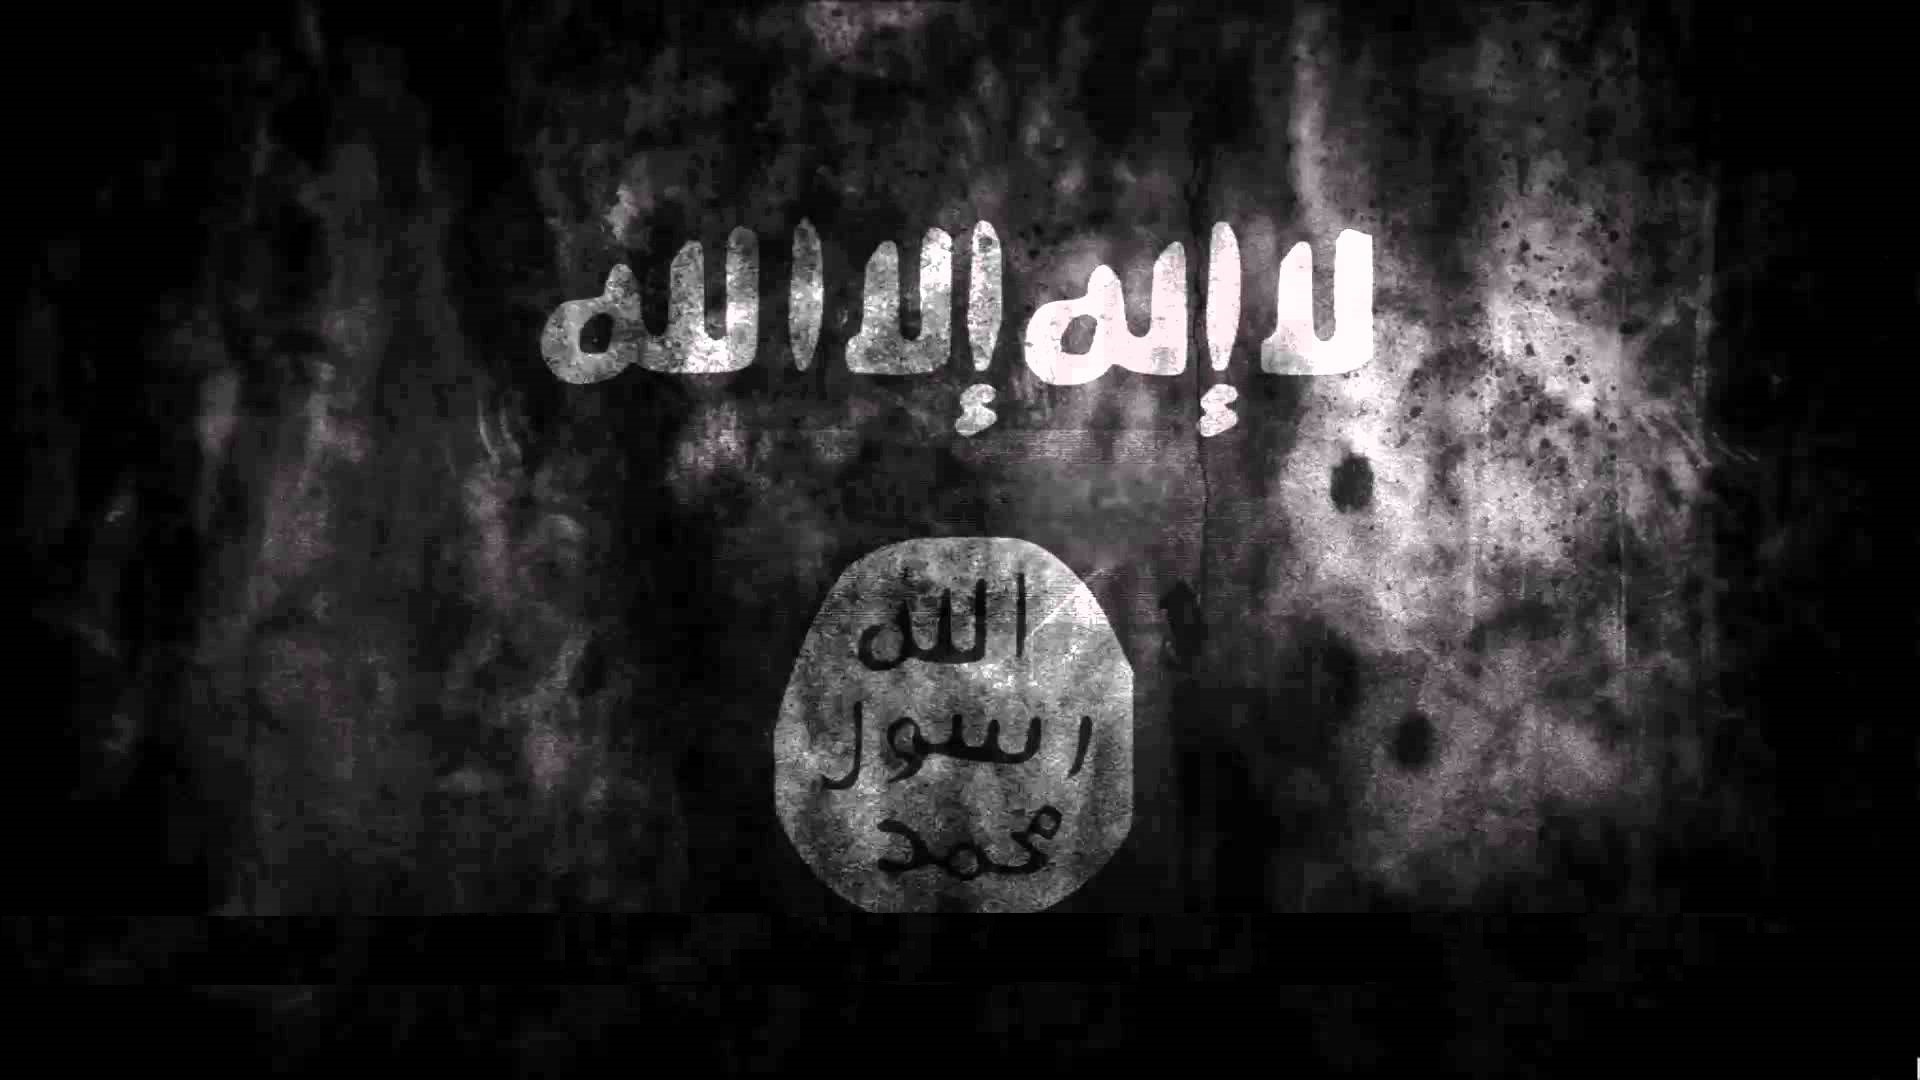 Res: 1920x1080, ... Paris. islamic-wallpapers-black-flag-mujahiddin-451